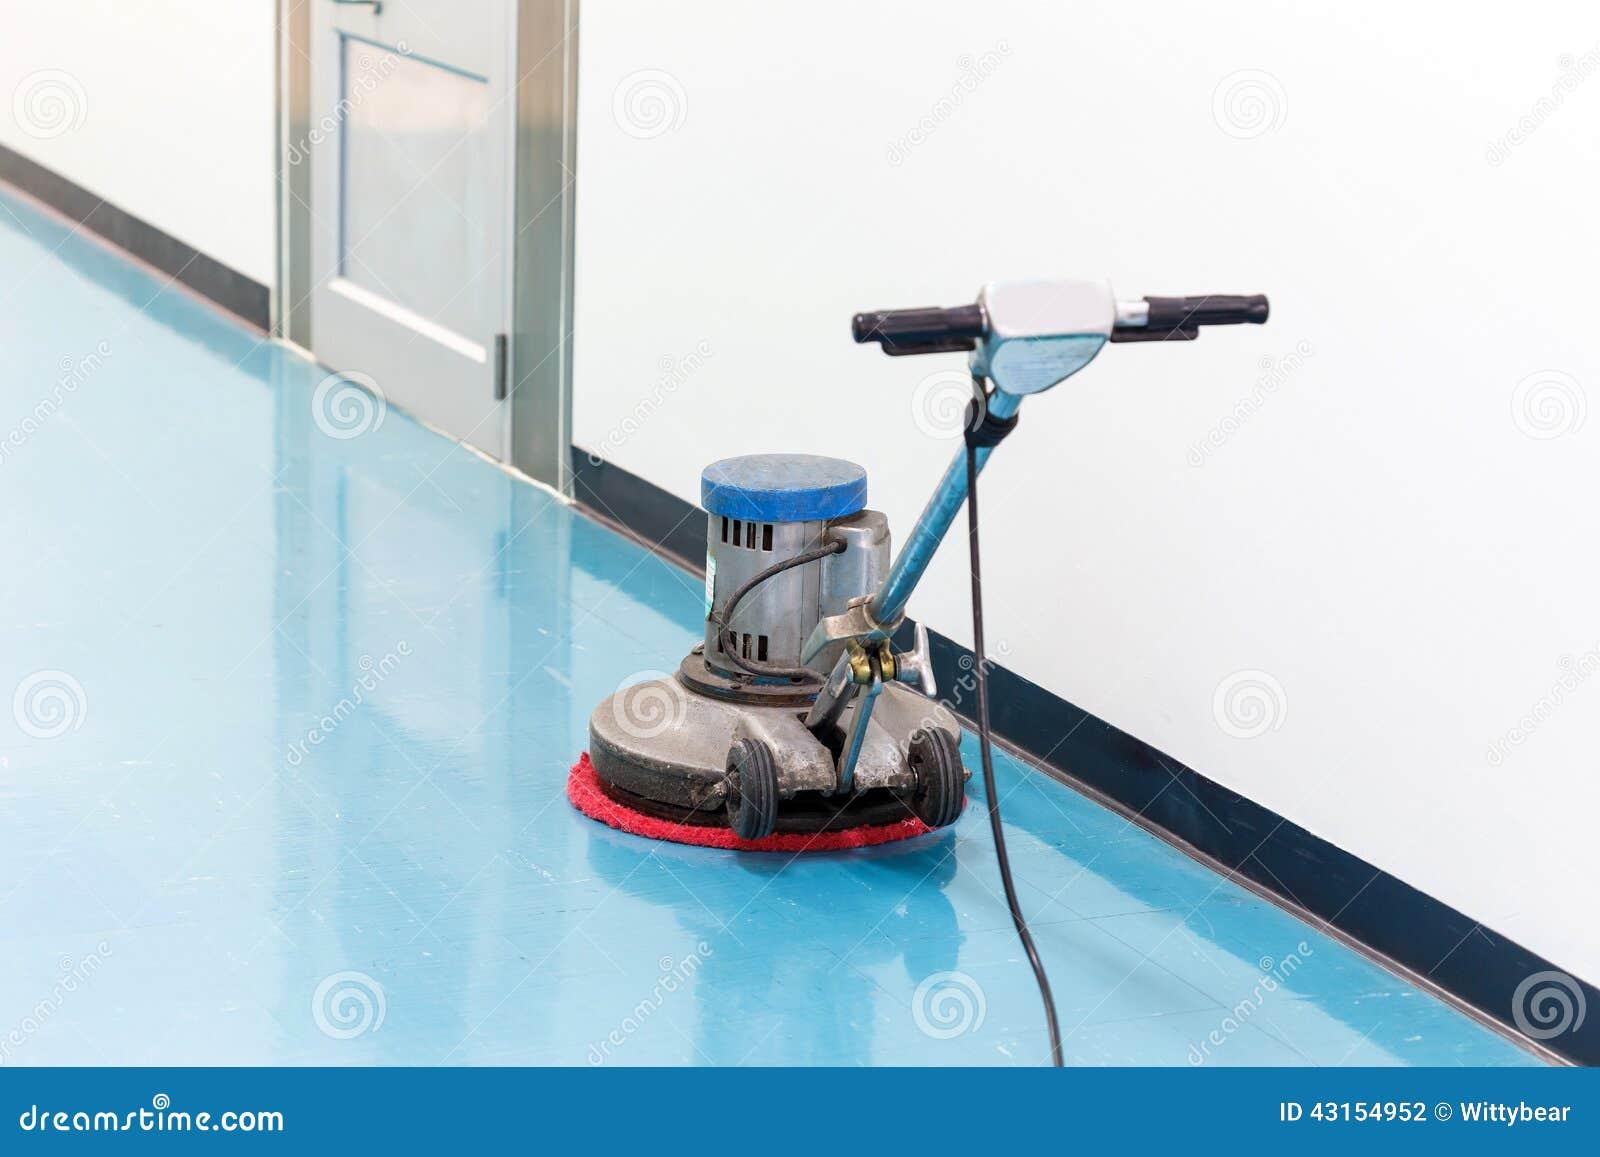 Cleaner machine for floor